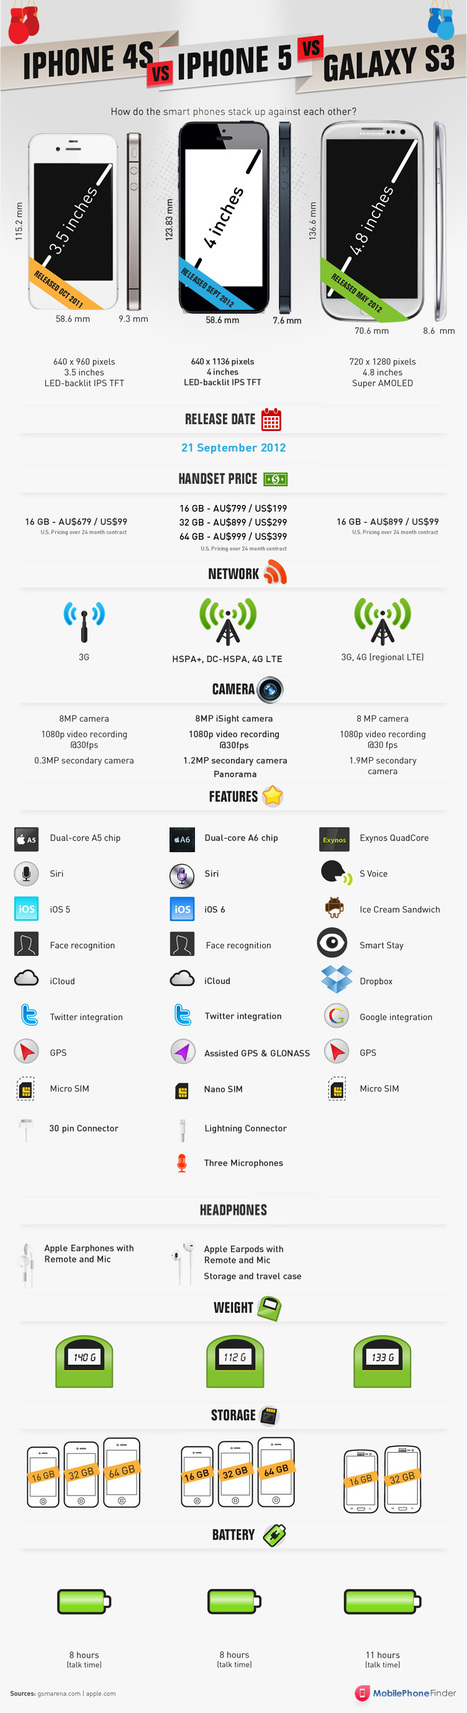 iPhone 4S vs iPhone 5 vs Samsung Galaxy S3 #infografia #infographic#apple | MobileWeb | Scoop.it